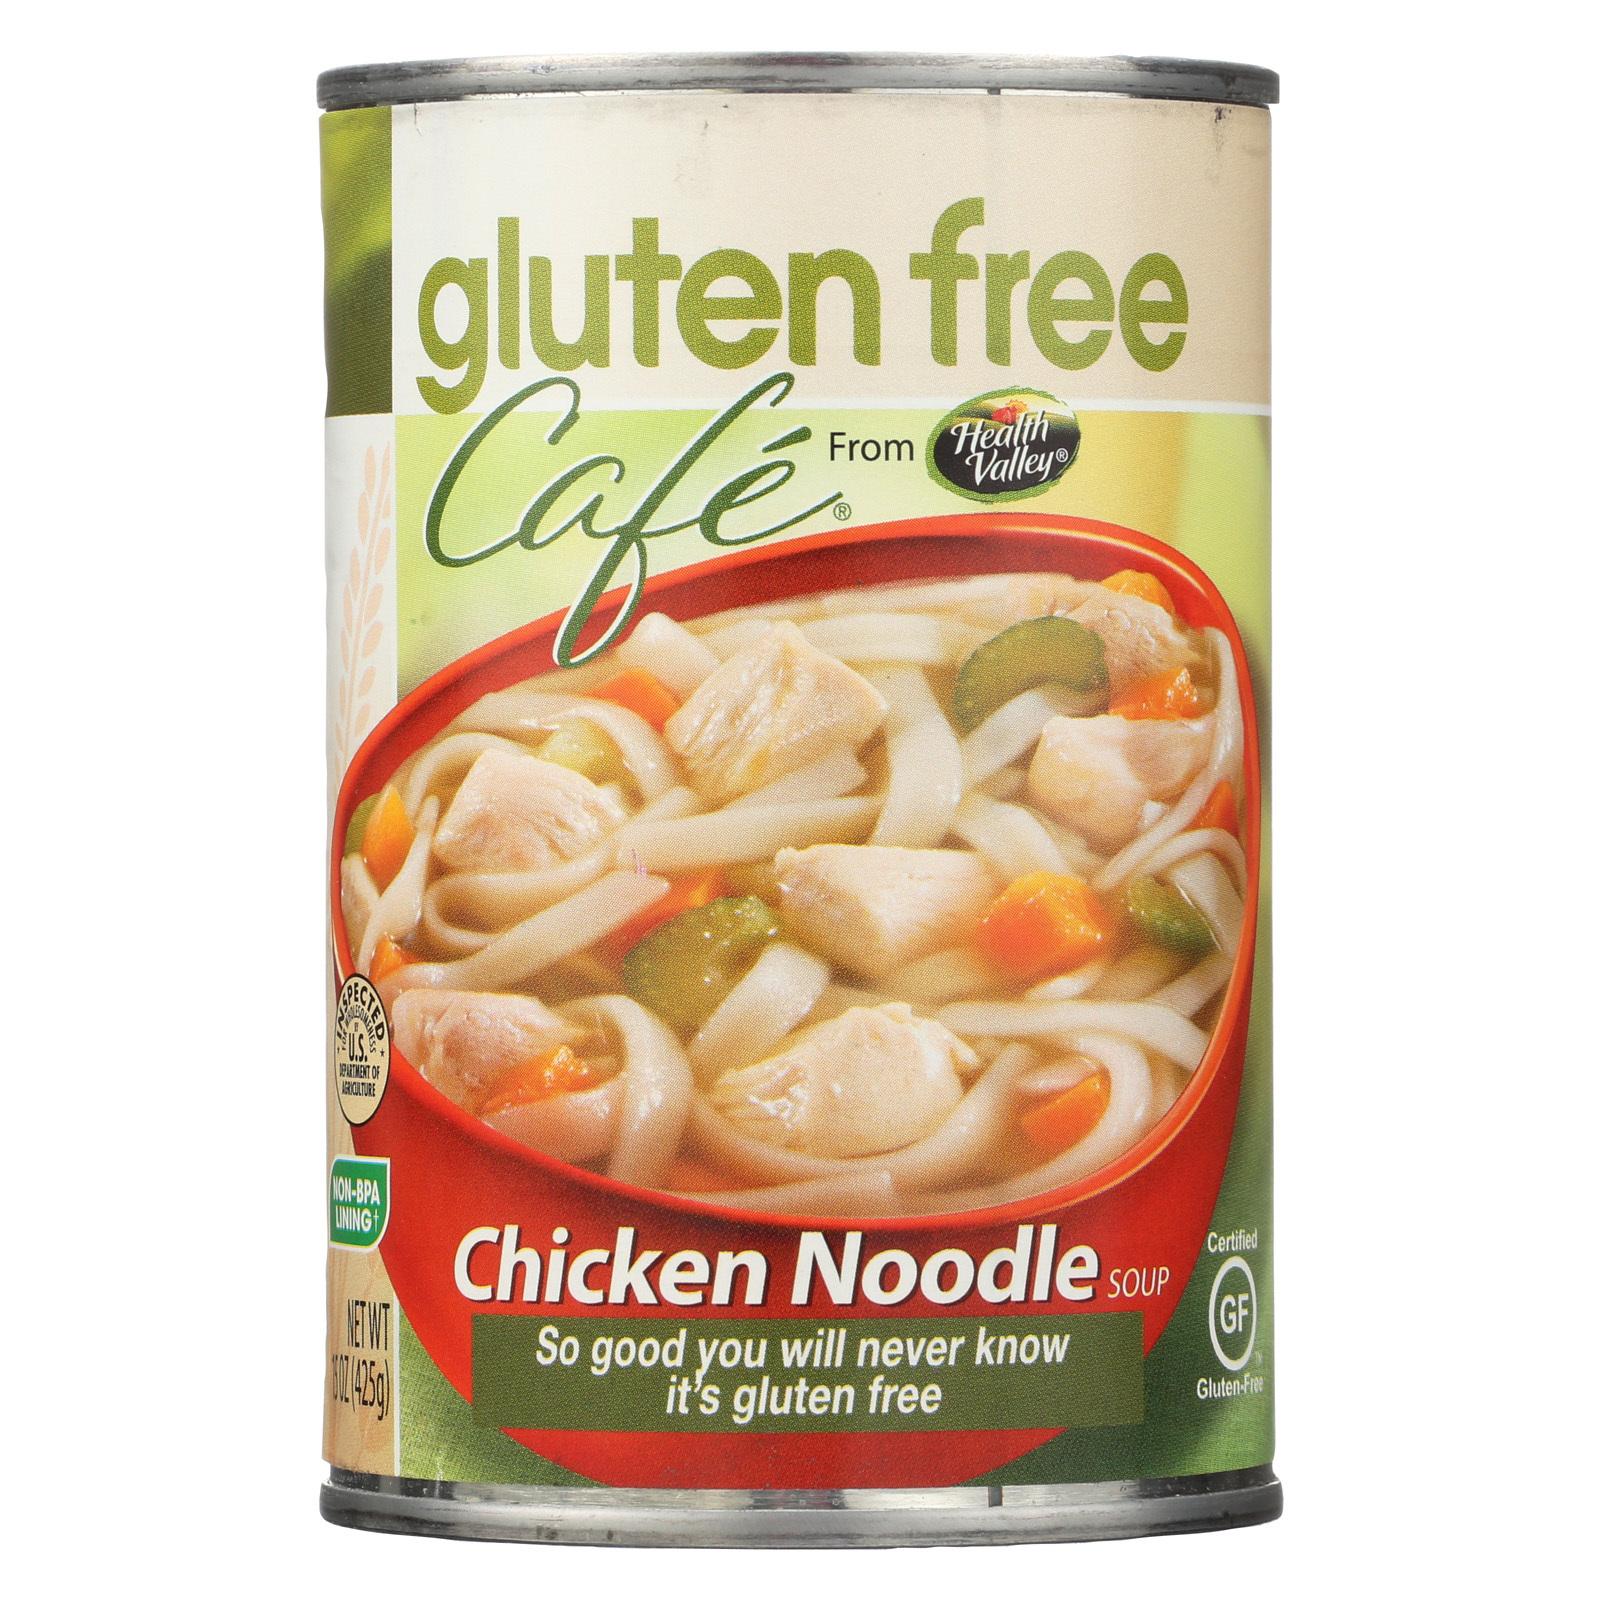 Gluten Free Caf? Noodle Soup - Chicken - Case of 12 - 15 oz.